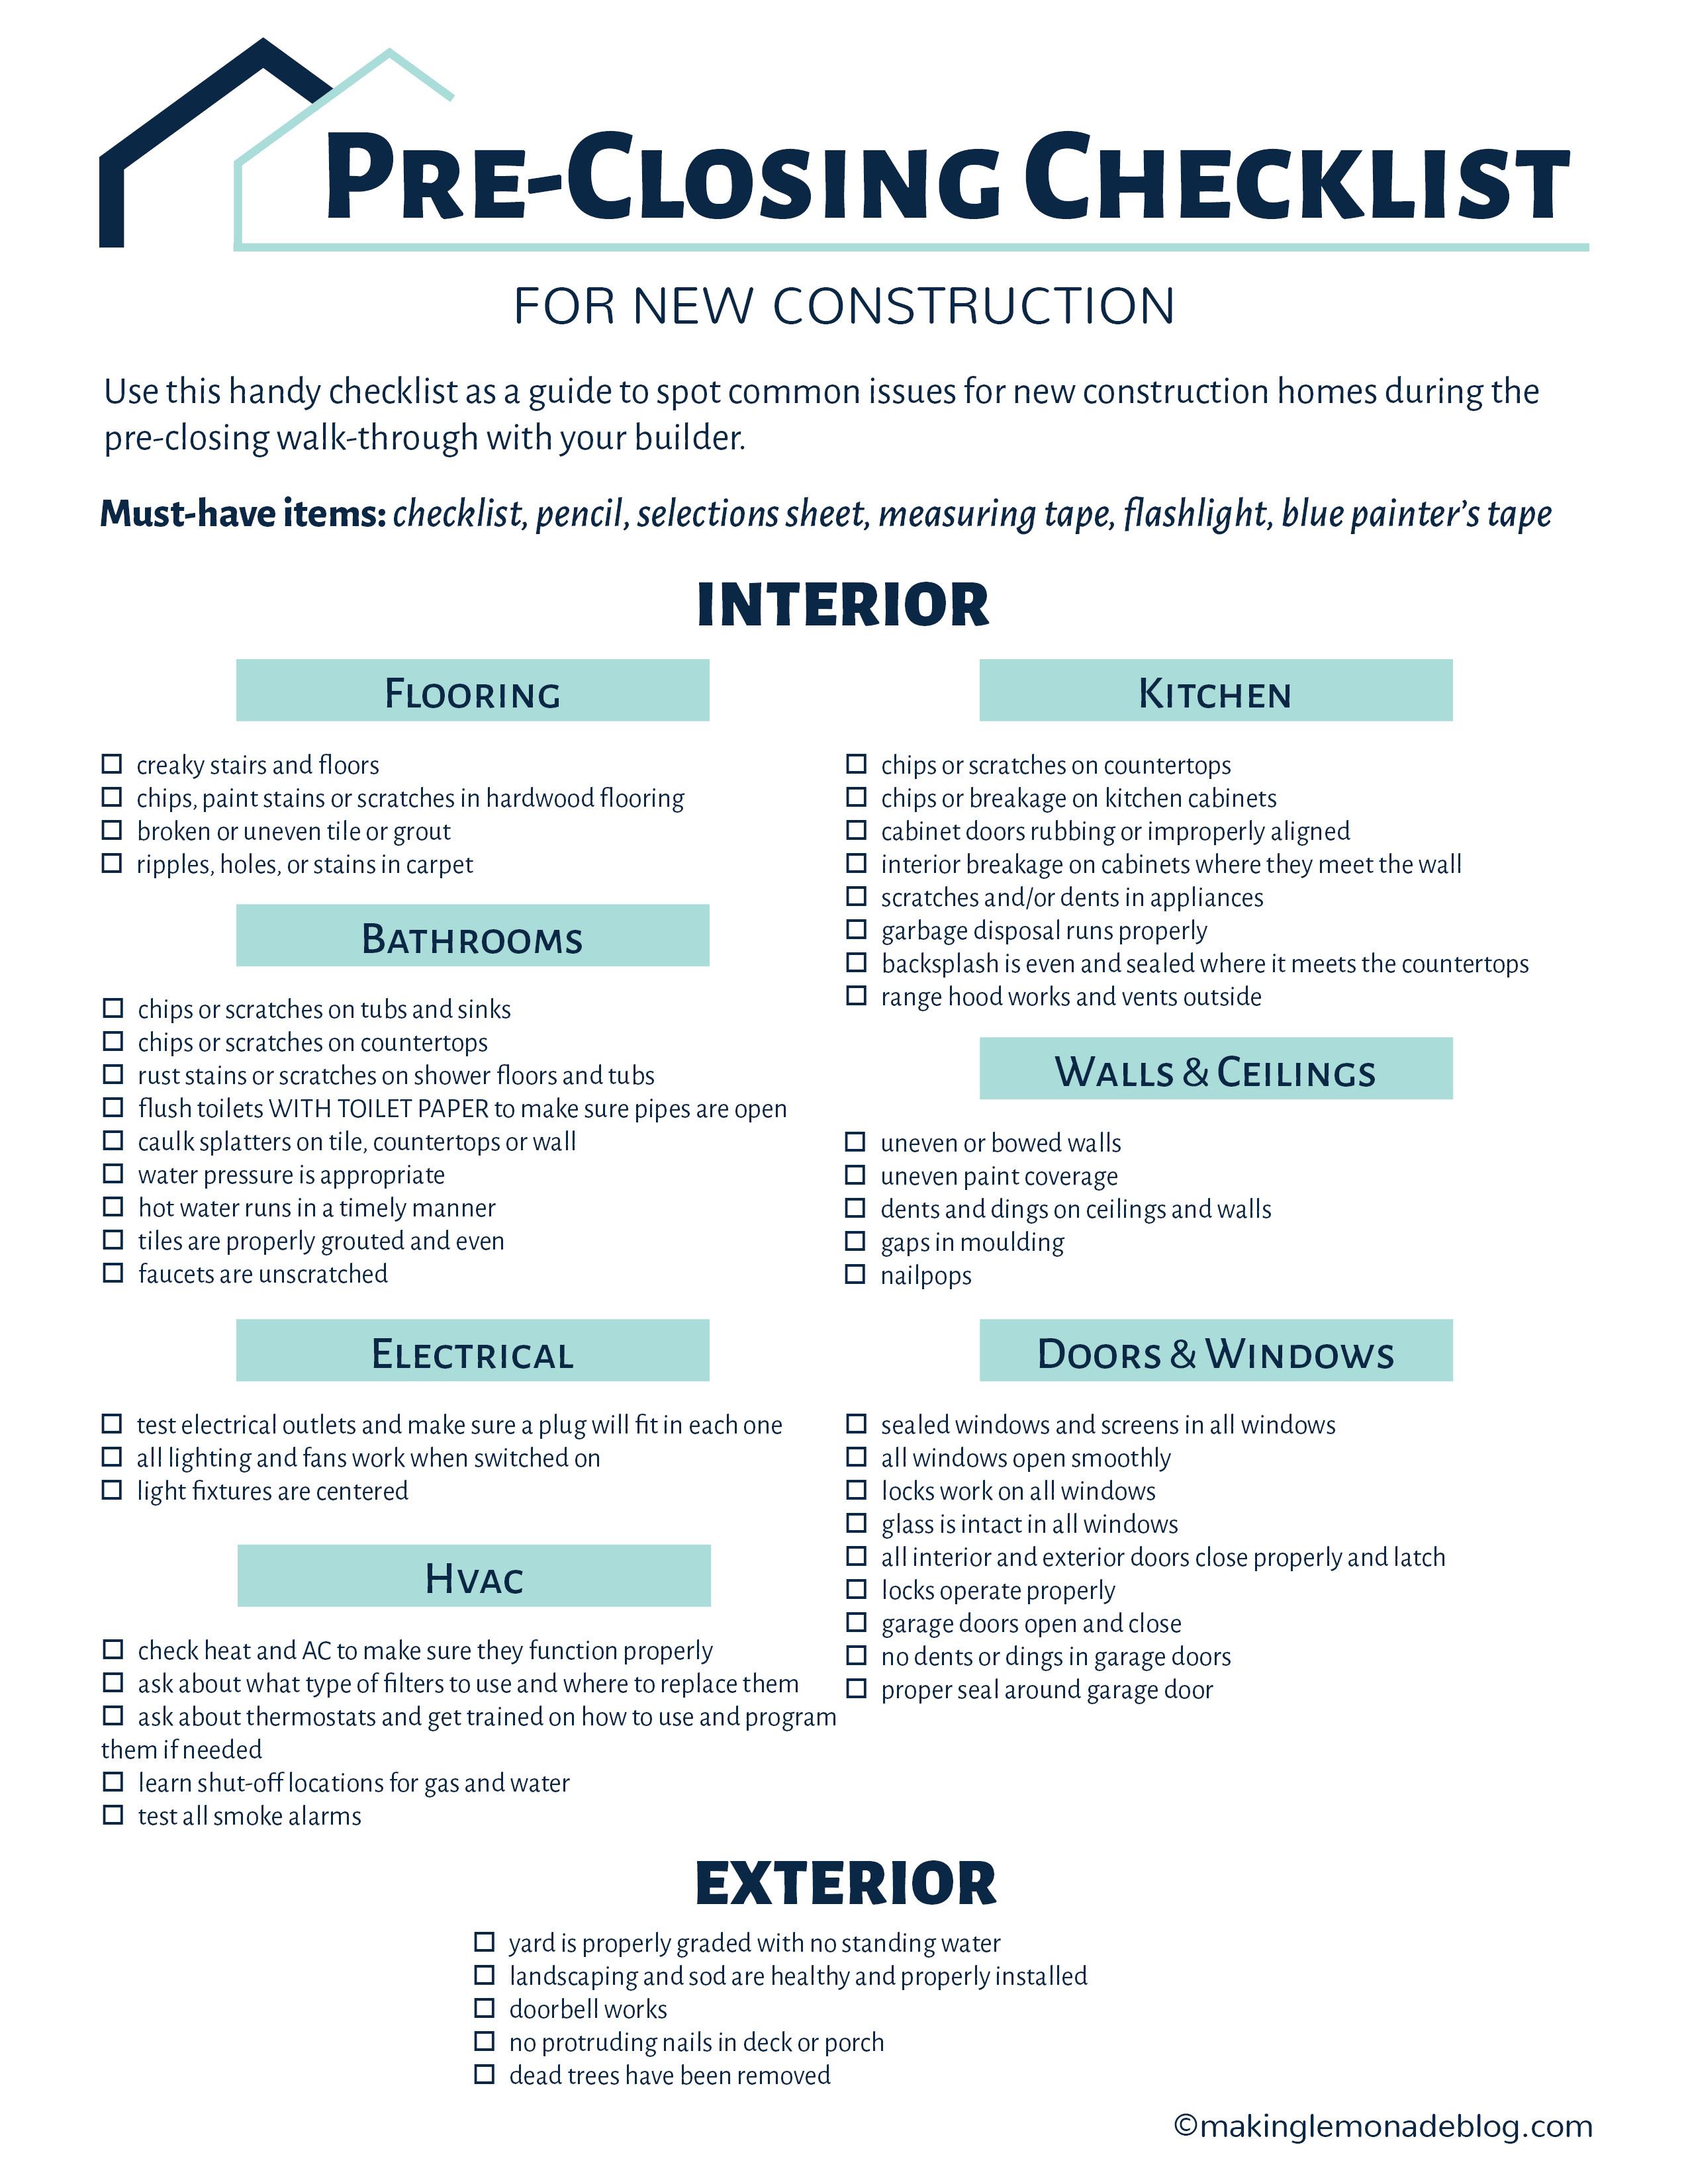 Building A House Grab This Free Checklist Making Lemonade